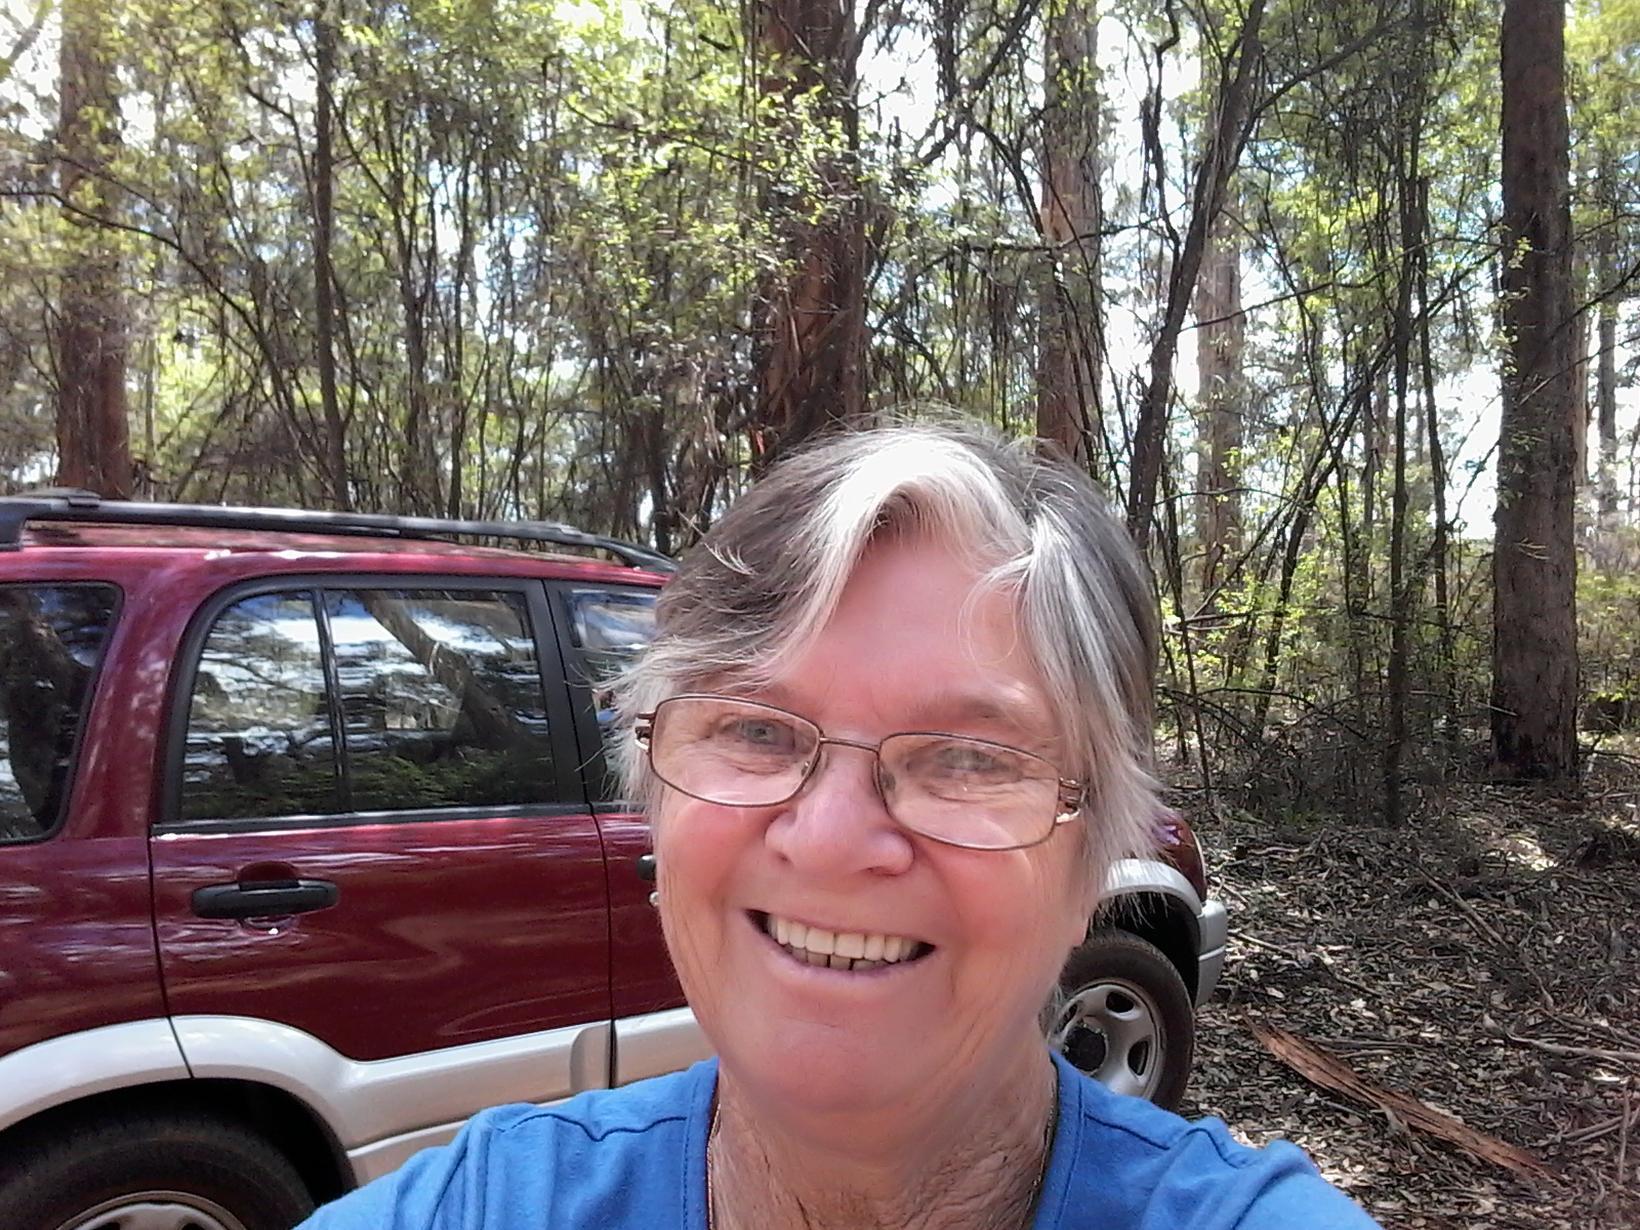 Elizabeth from Manjimup, Western Australia, Australia